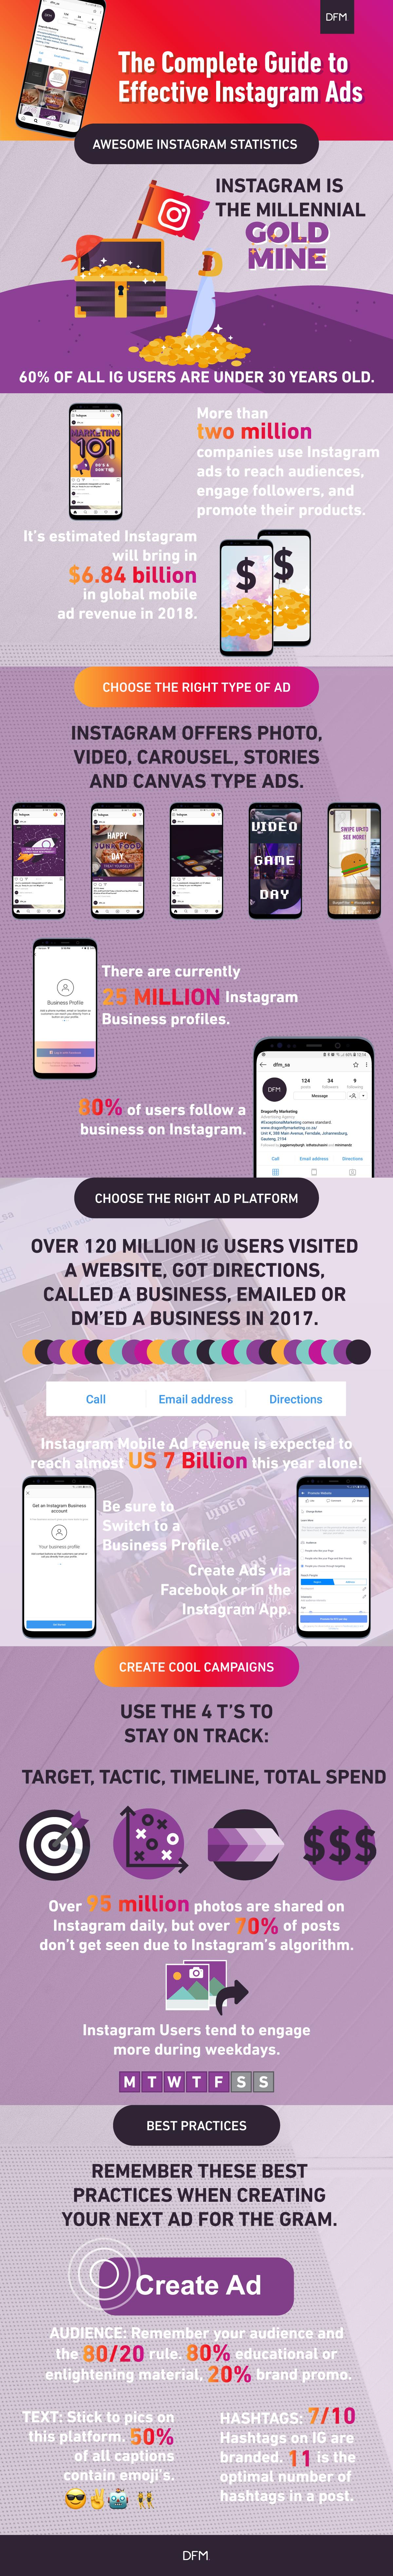 DFM Infographic Instagram Ads